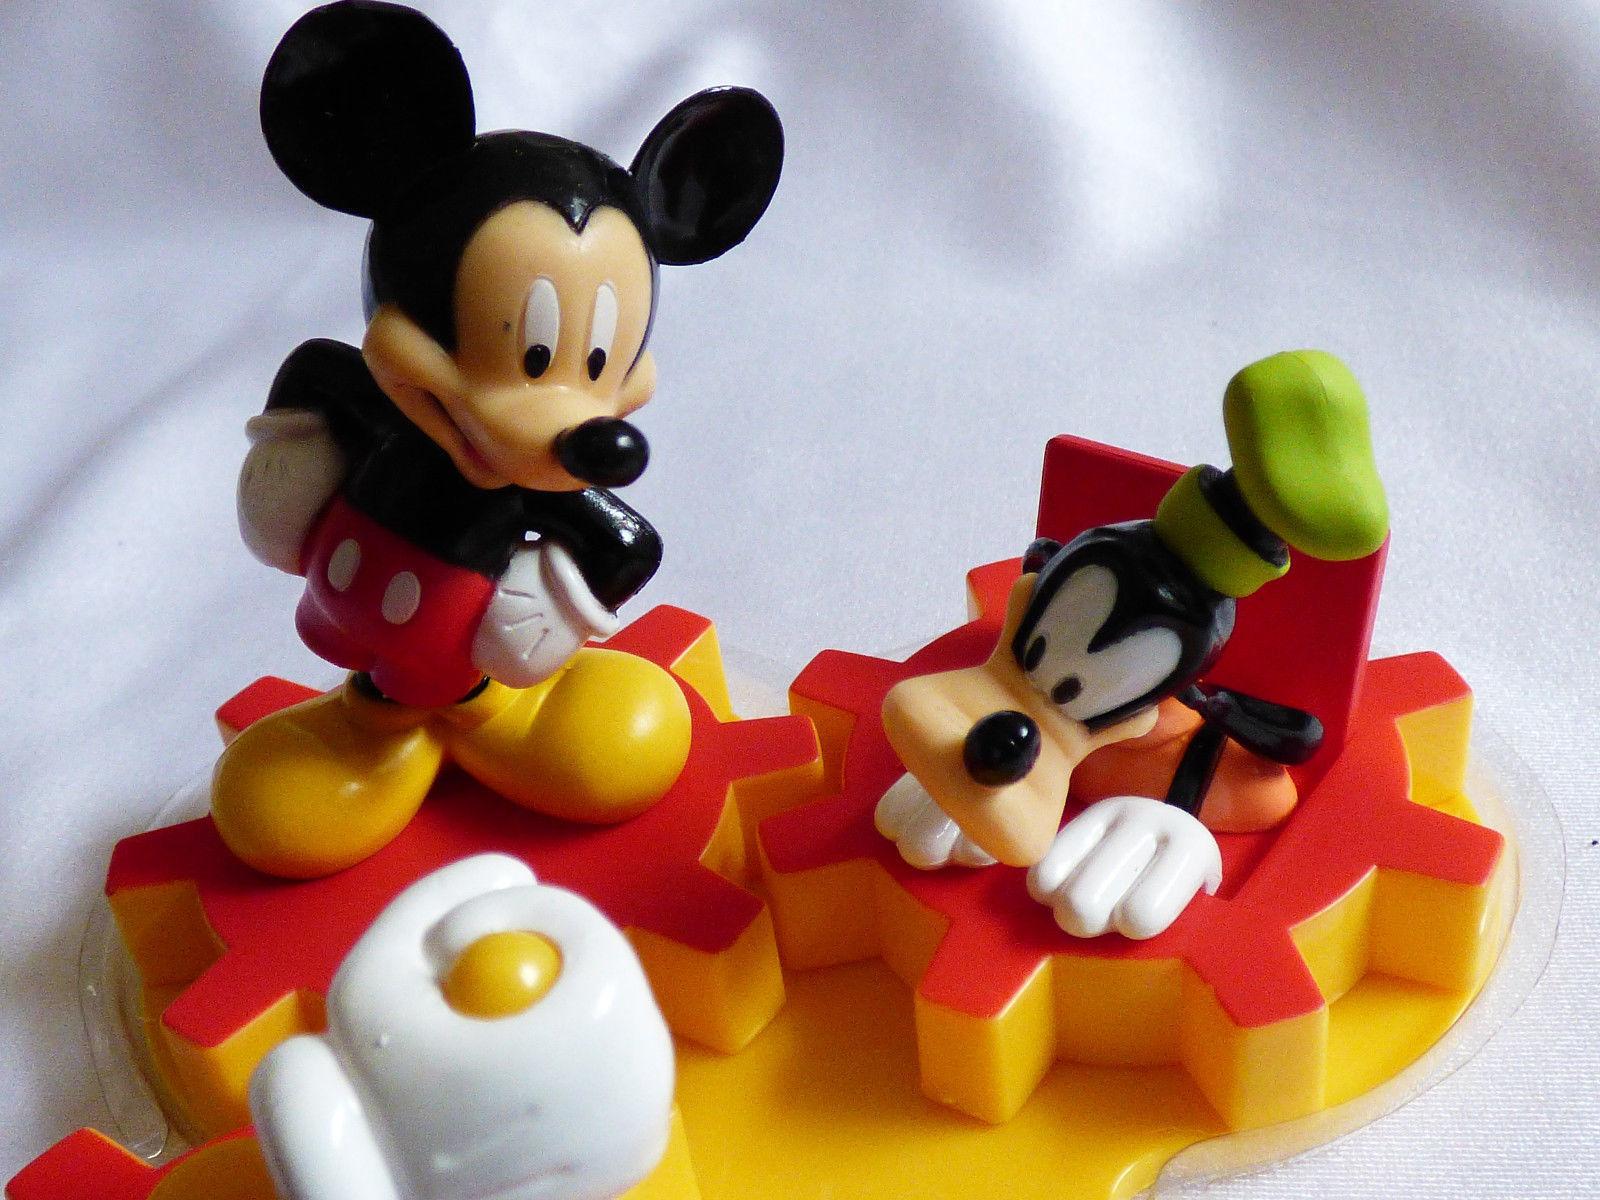 Bakery DecoPac Mickey & Pluto Fun Gears Decopack Figurines Cake Kit Toppers NIB